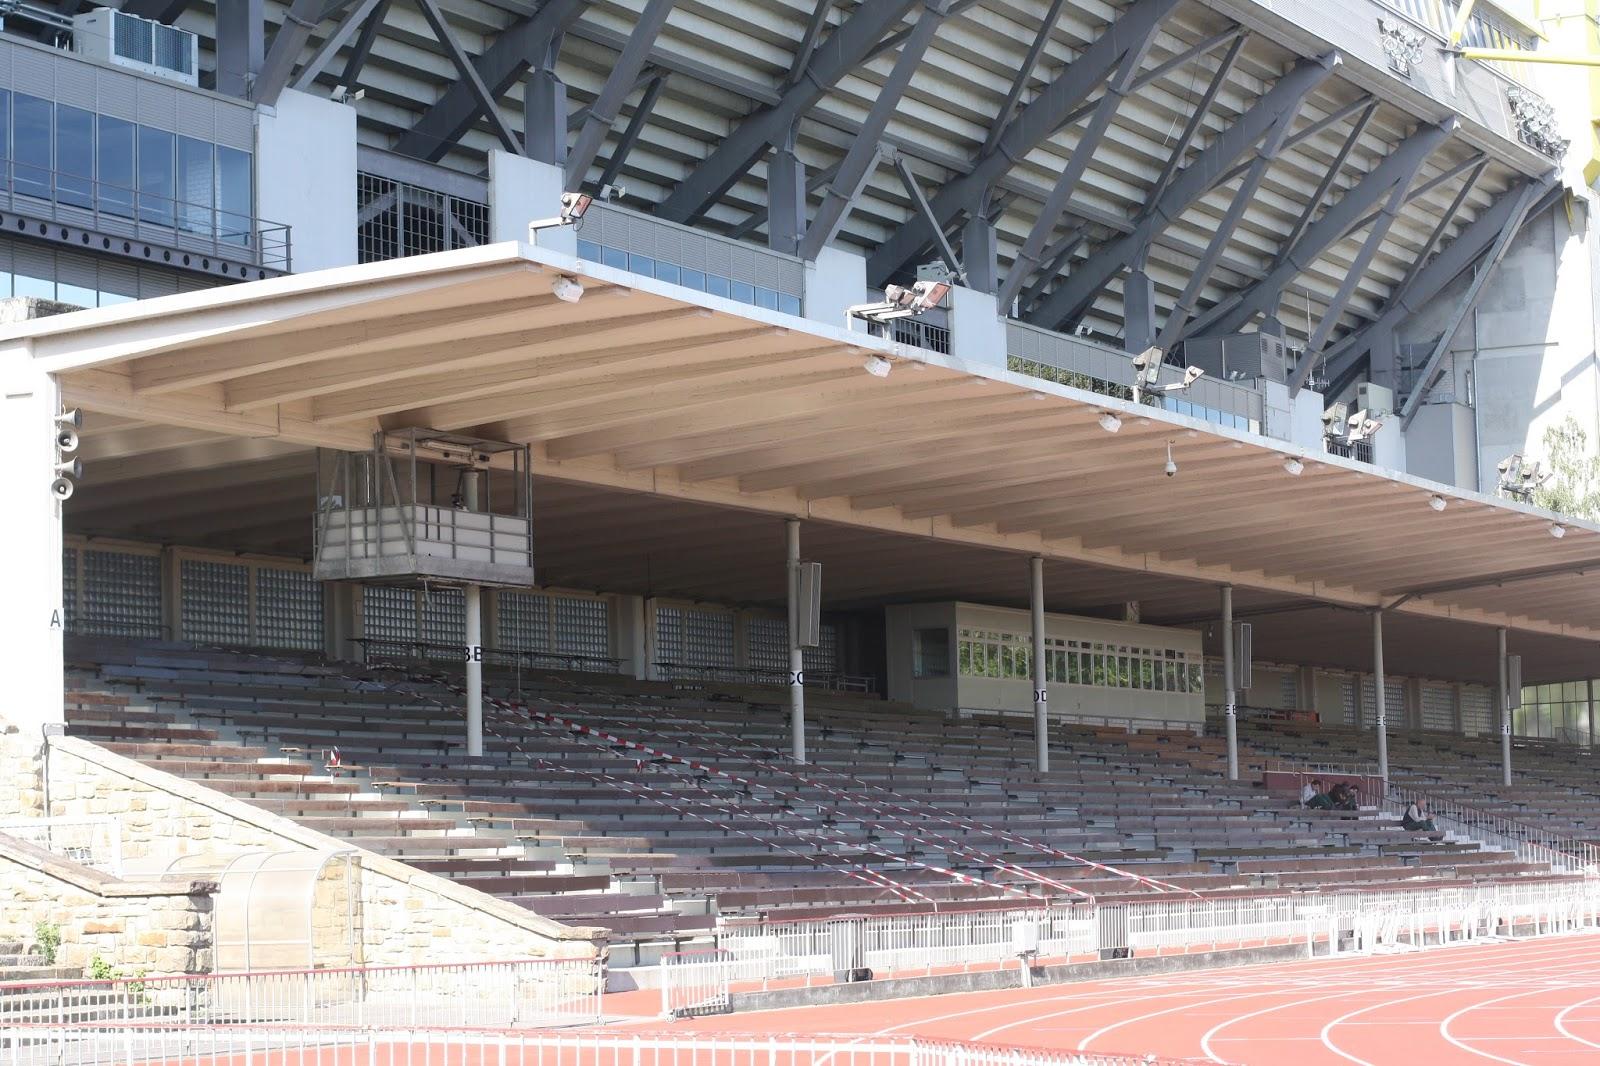 Stadion Dortmund Faßungsvermögen